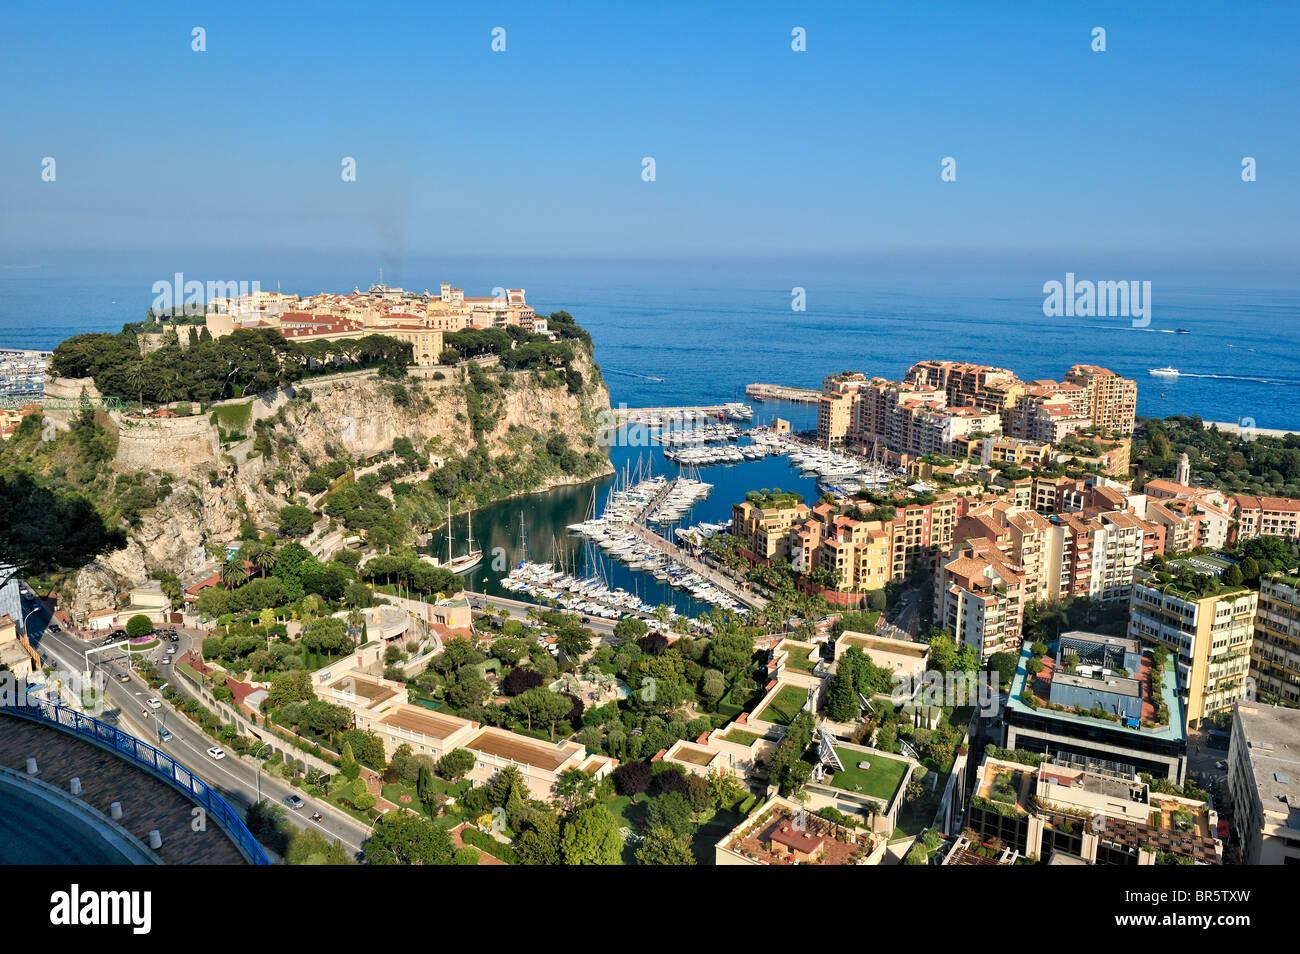 Fontvieille harbour, Monaco, France. - Stock Image